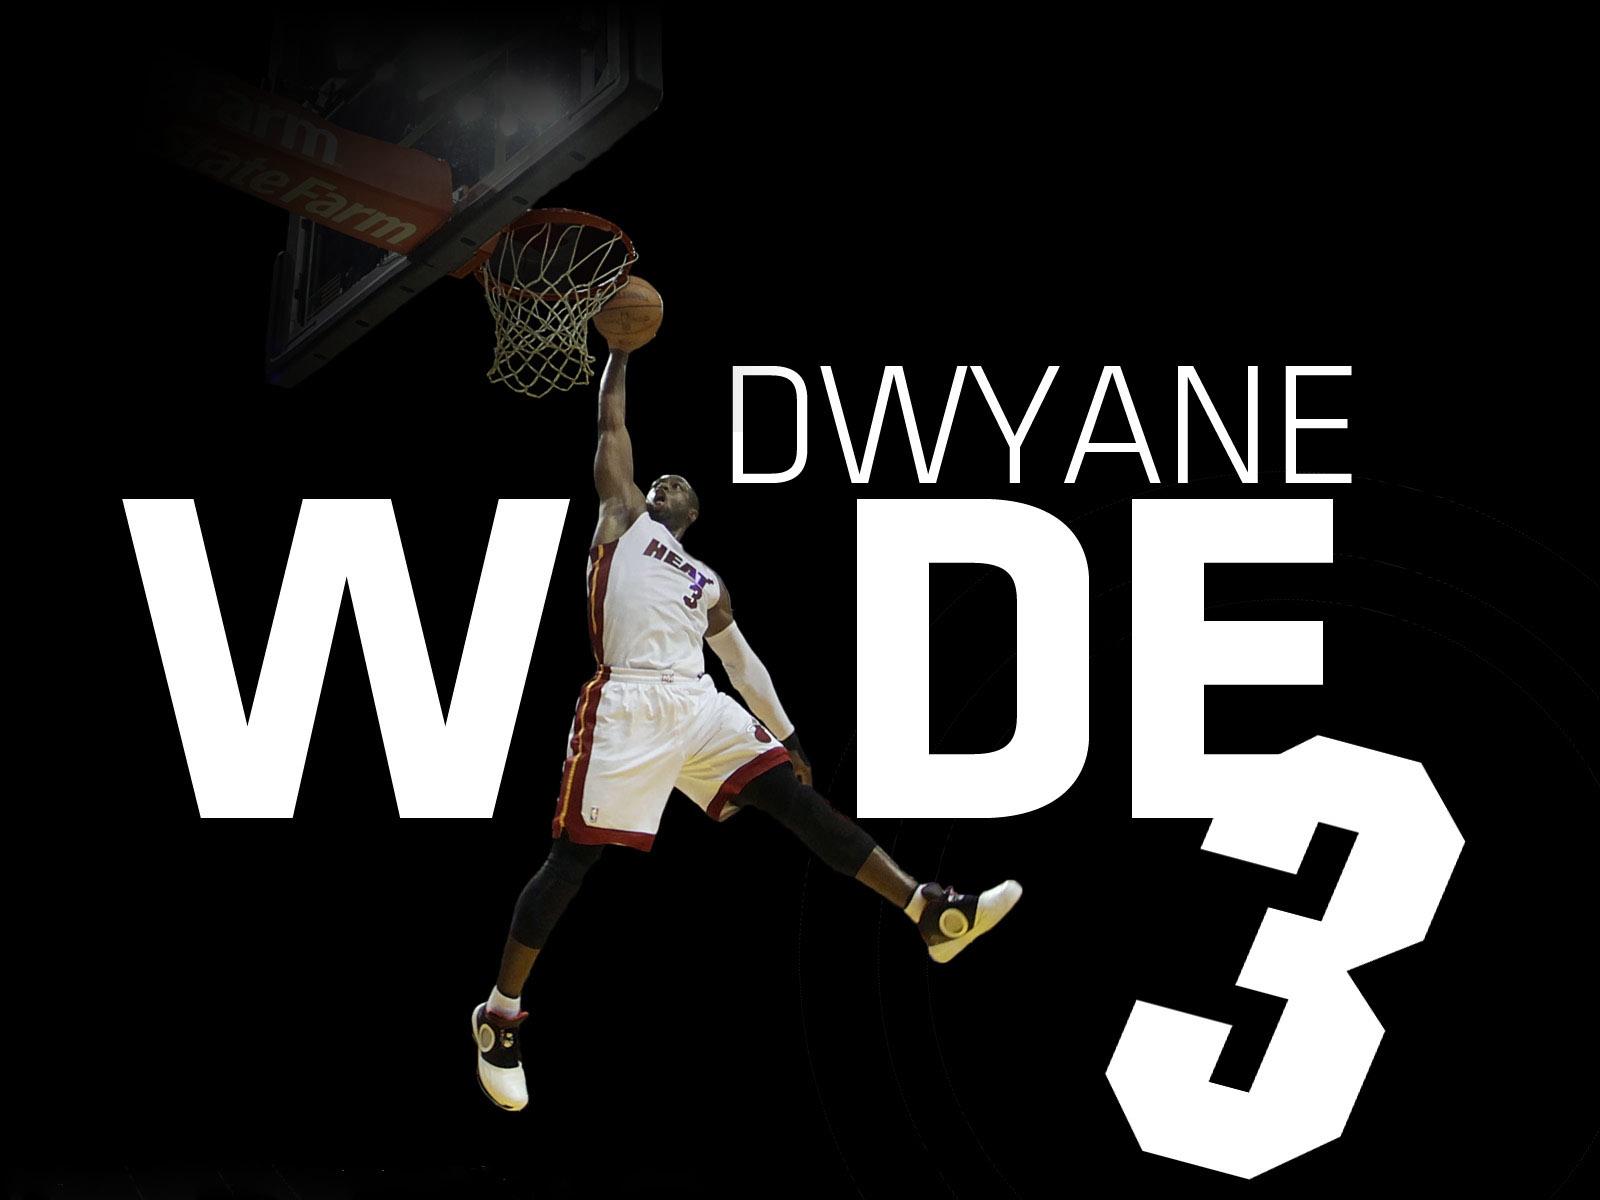 Dwyane Wade SlumDunk Wallpaper Dwyane Wade SlumDunk Wallpaper 1600x1200